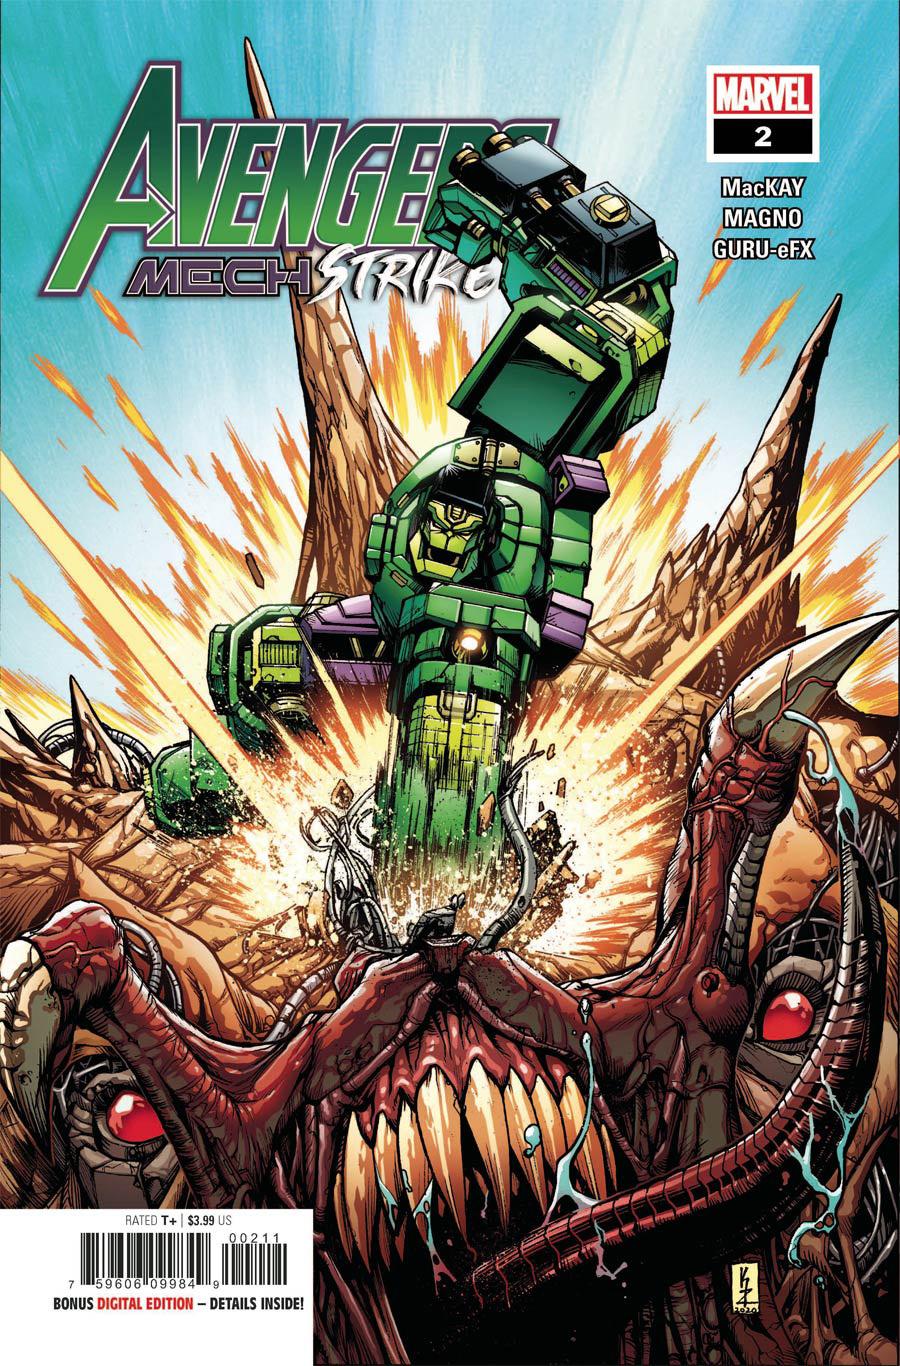 Avengers Mech Strike #2 Cover A Regular Kei Zama Cover